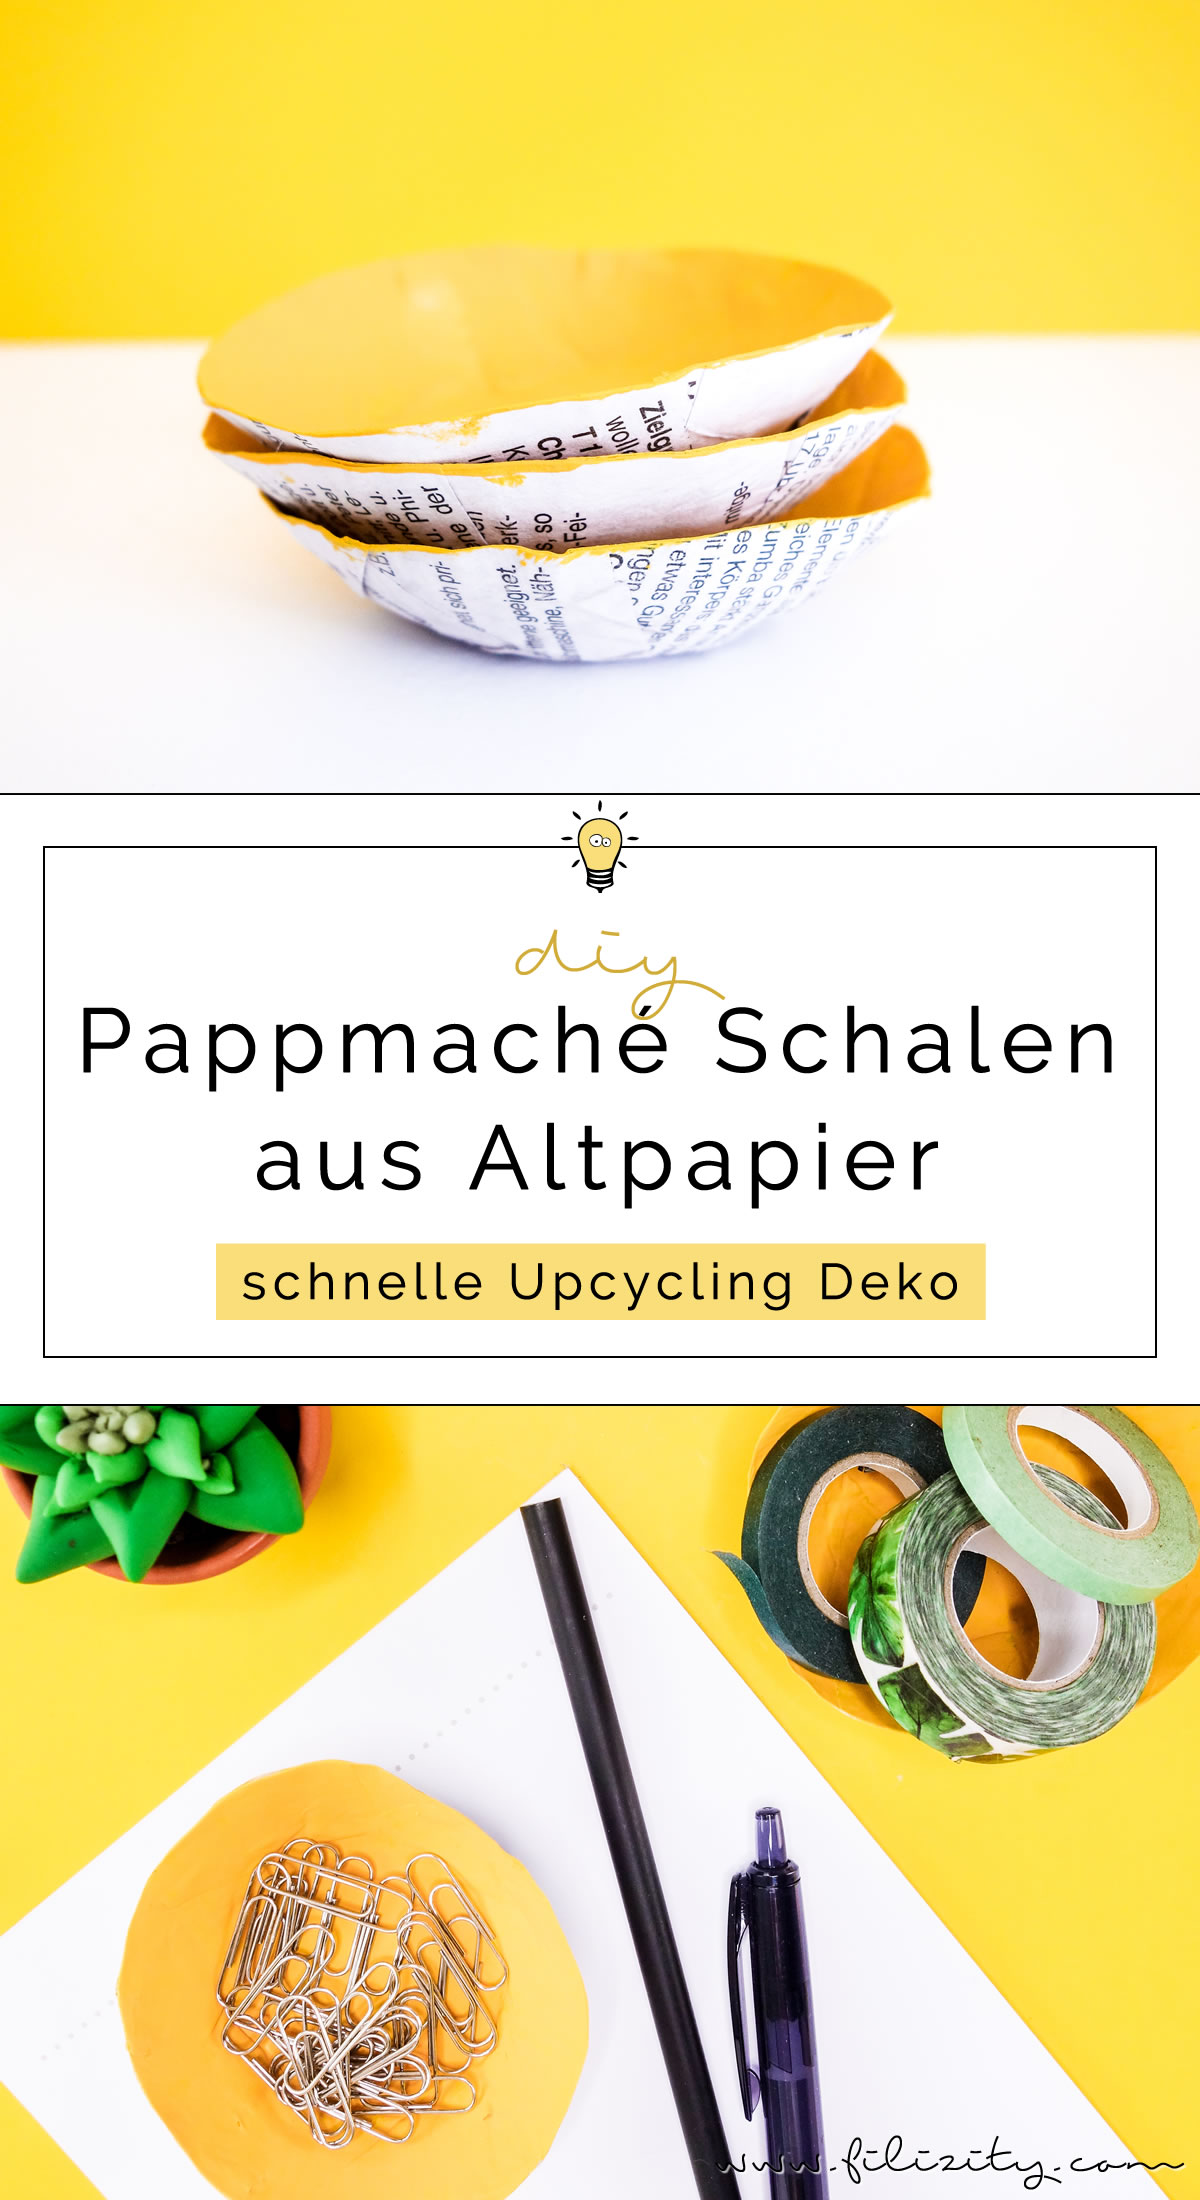 DIY Pappmaché Schalen aus Altpapier - 5 Blogs 1000 Ideen | Filizity.com - DIY Blog aus dem Rheinland